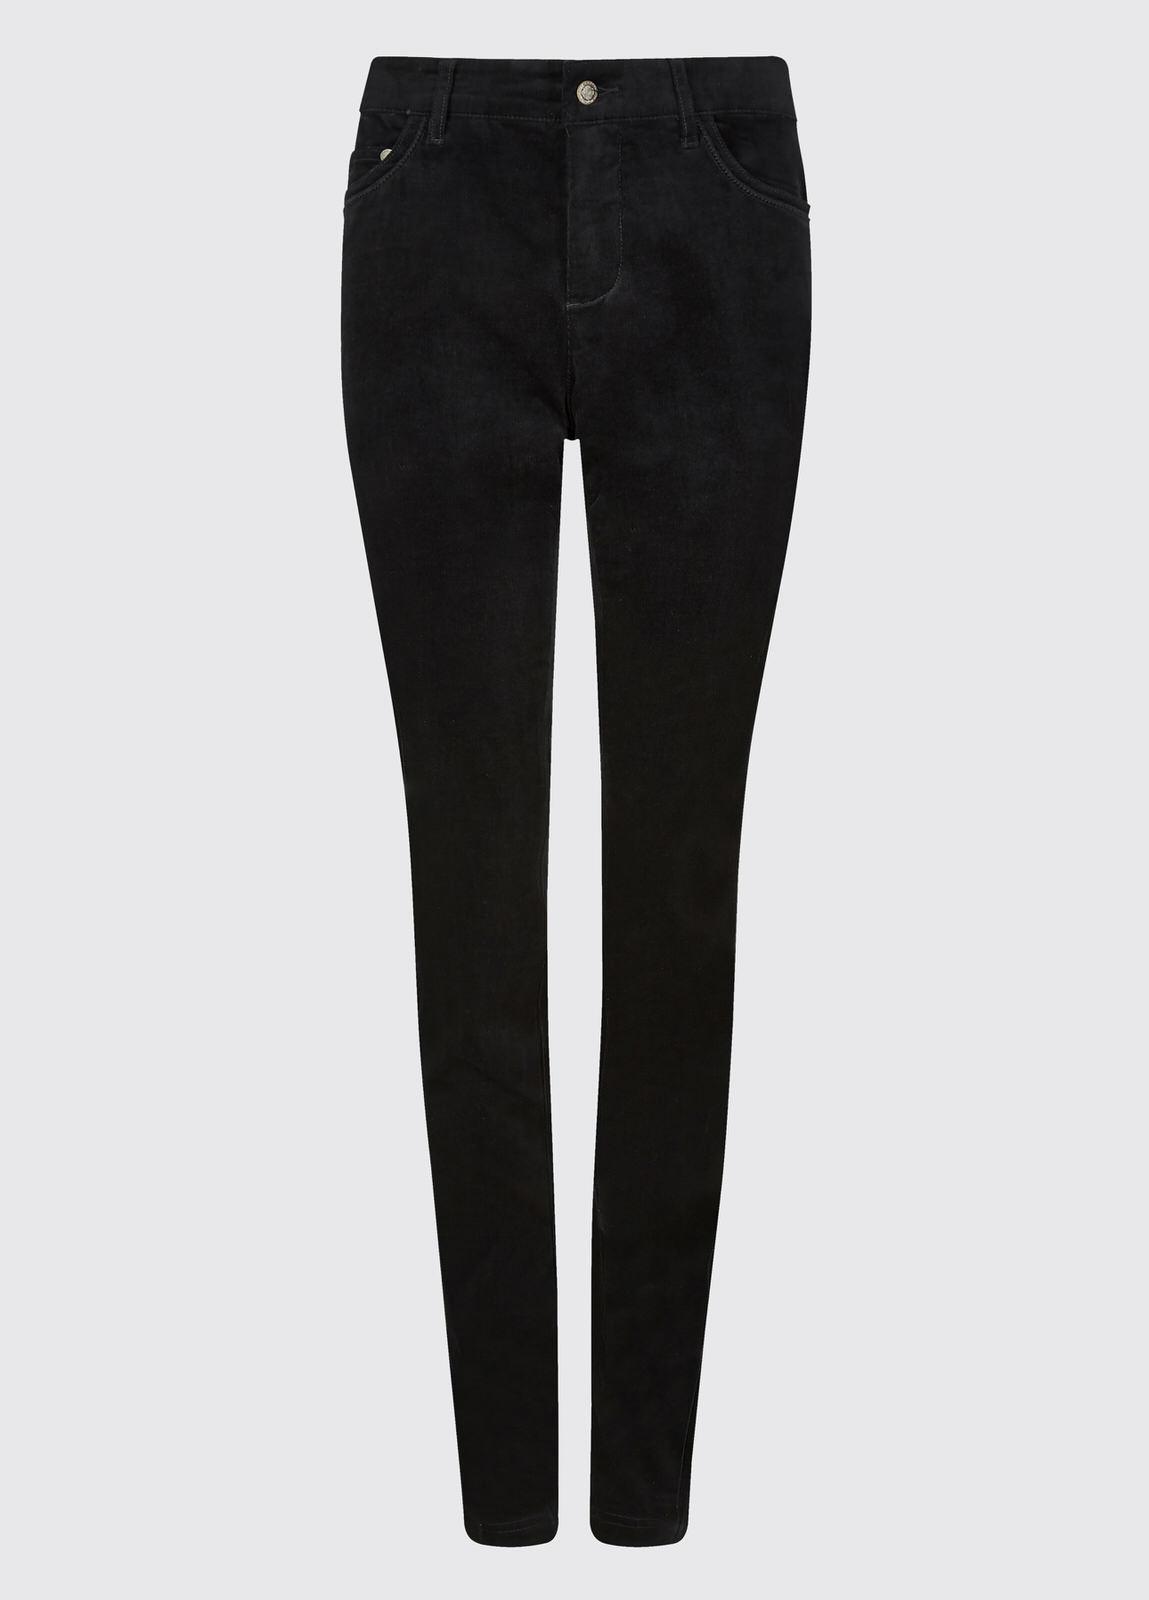 Honeysuckle Jeans - Black